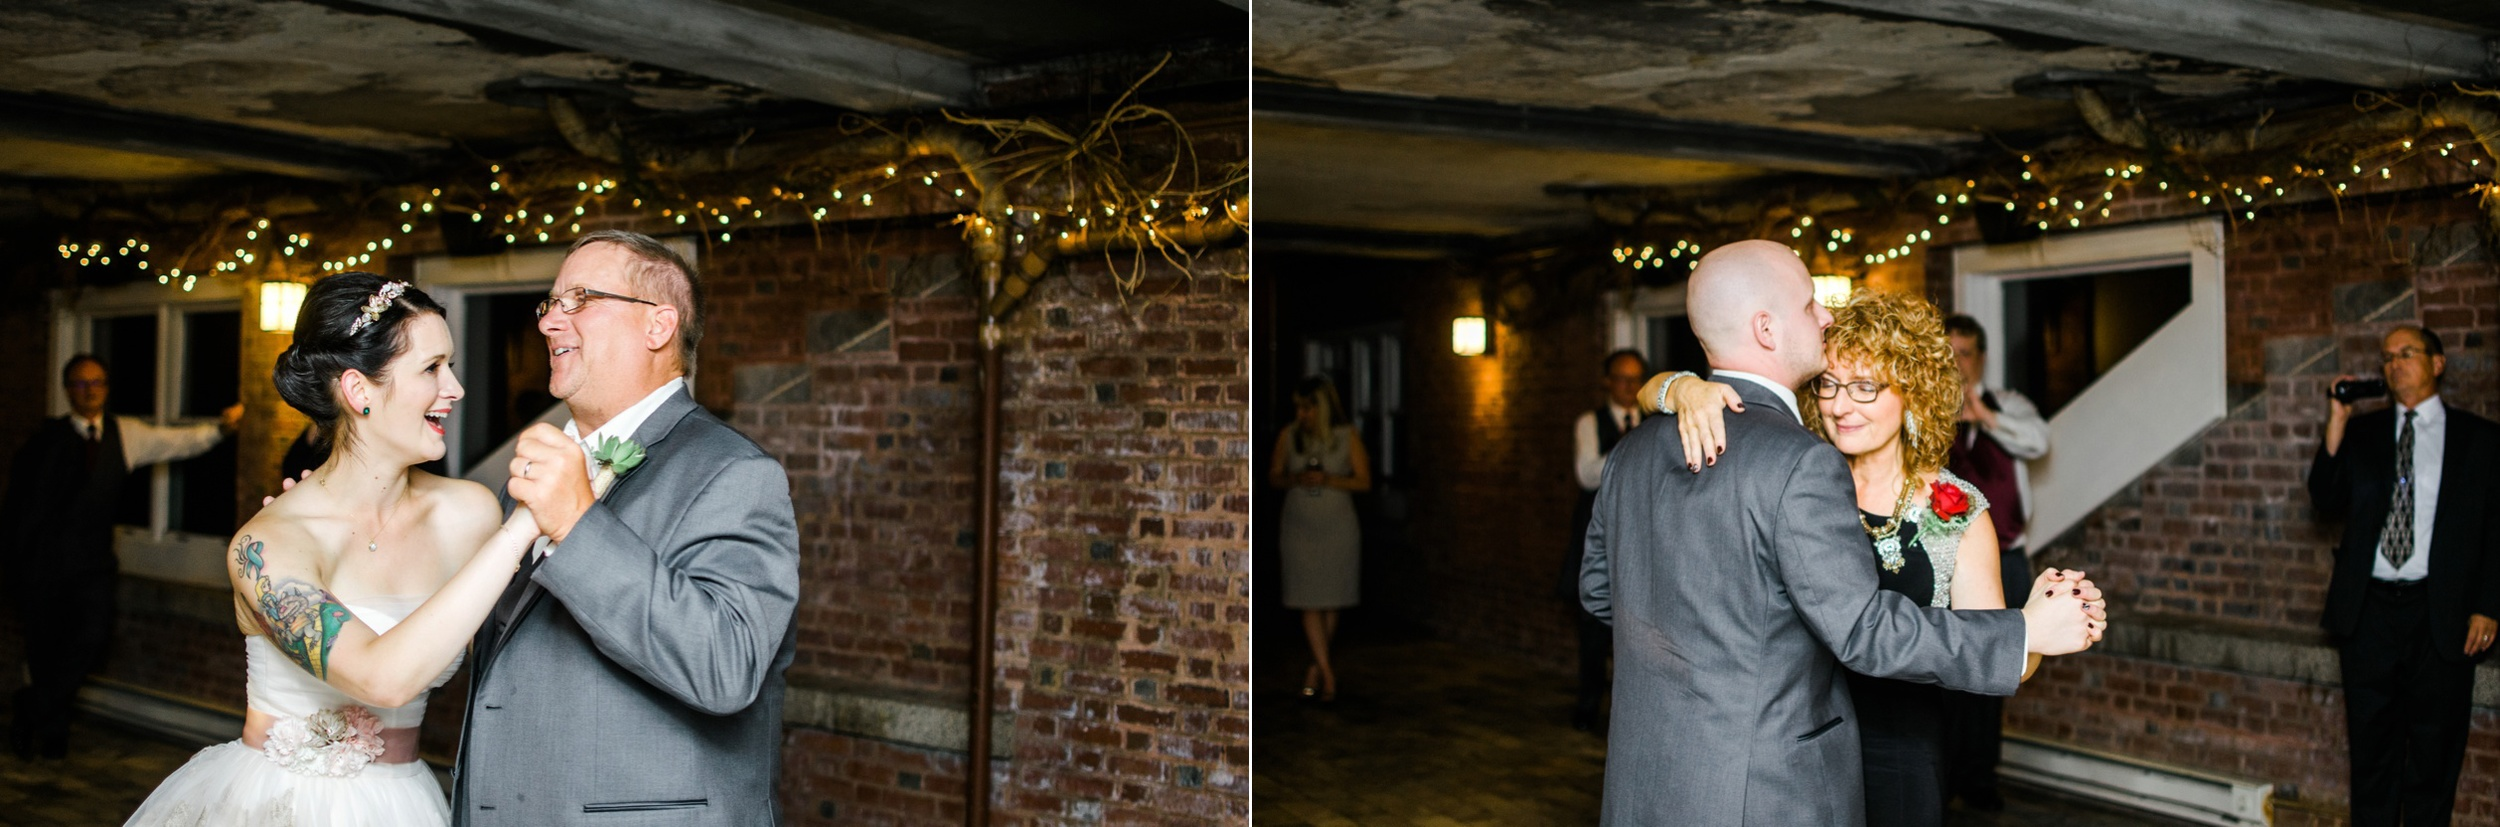 Glensheen Mansion Wedding | Duluth, MN Wedding Photographer_0525.jpg